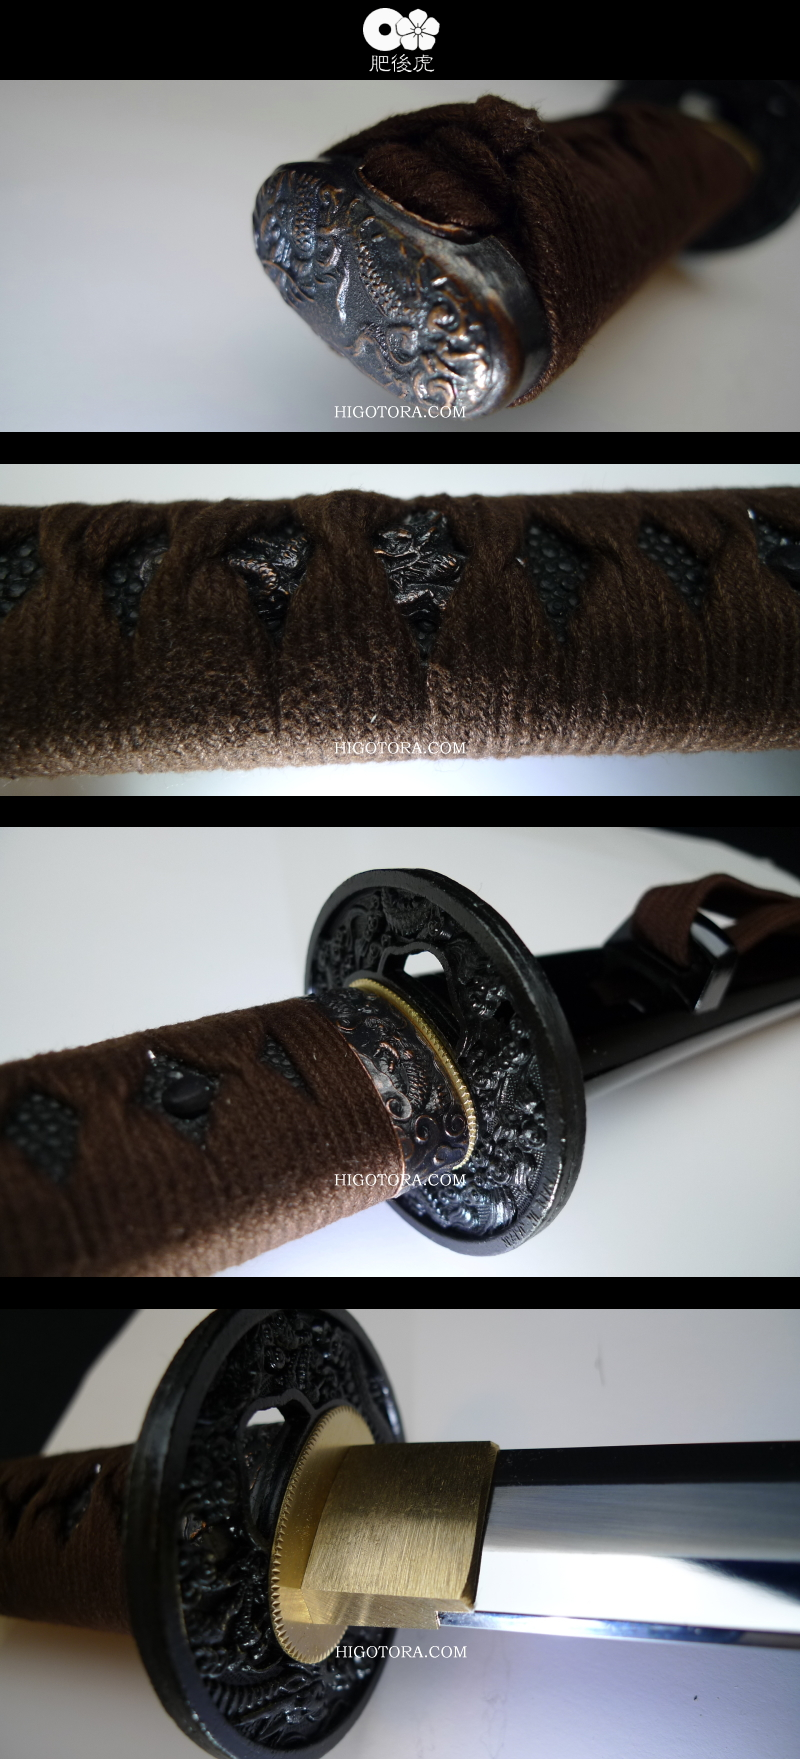 1尺5寸 肥後虎 脇差(居合道用模擬刀) セミオーダー